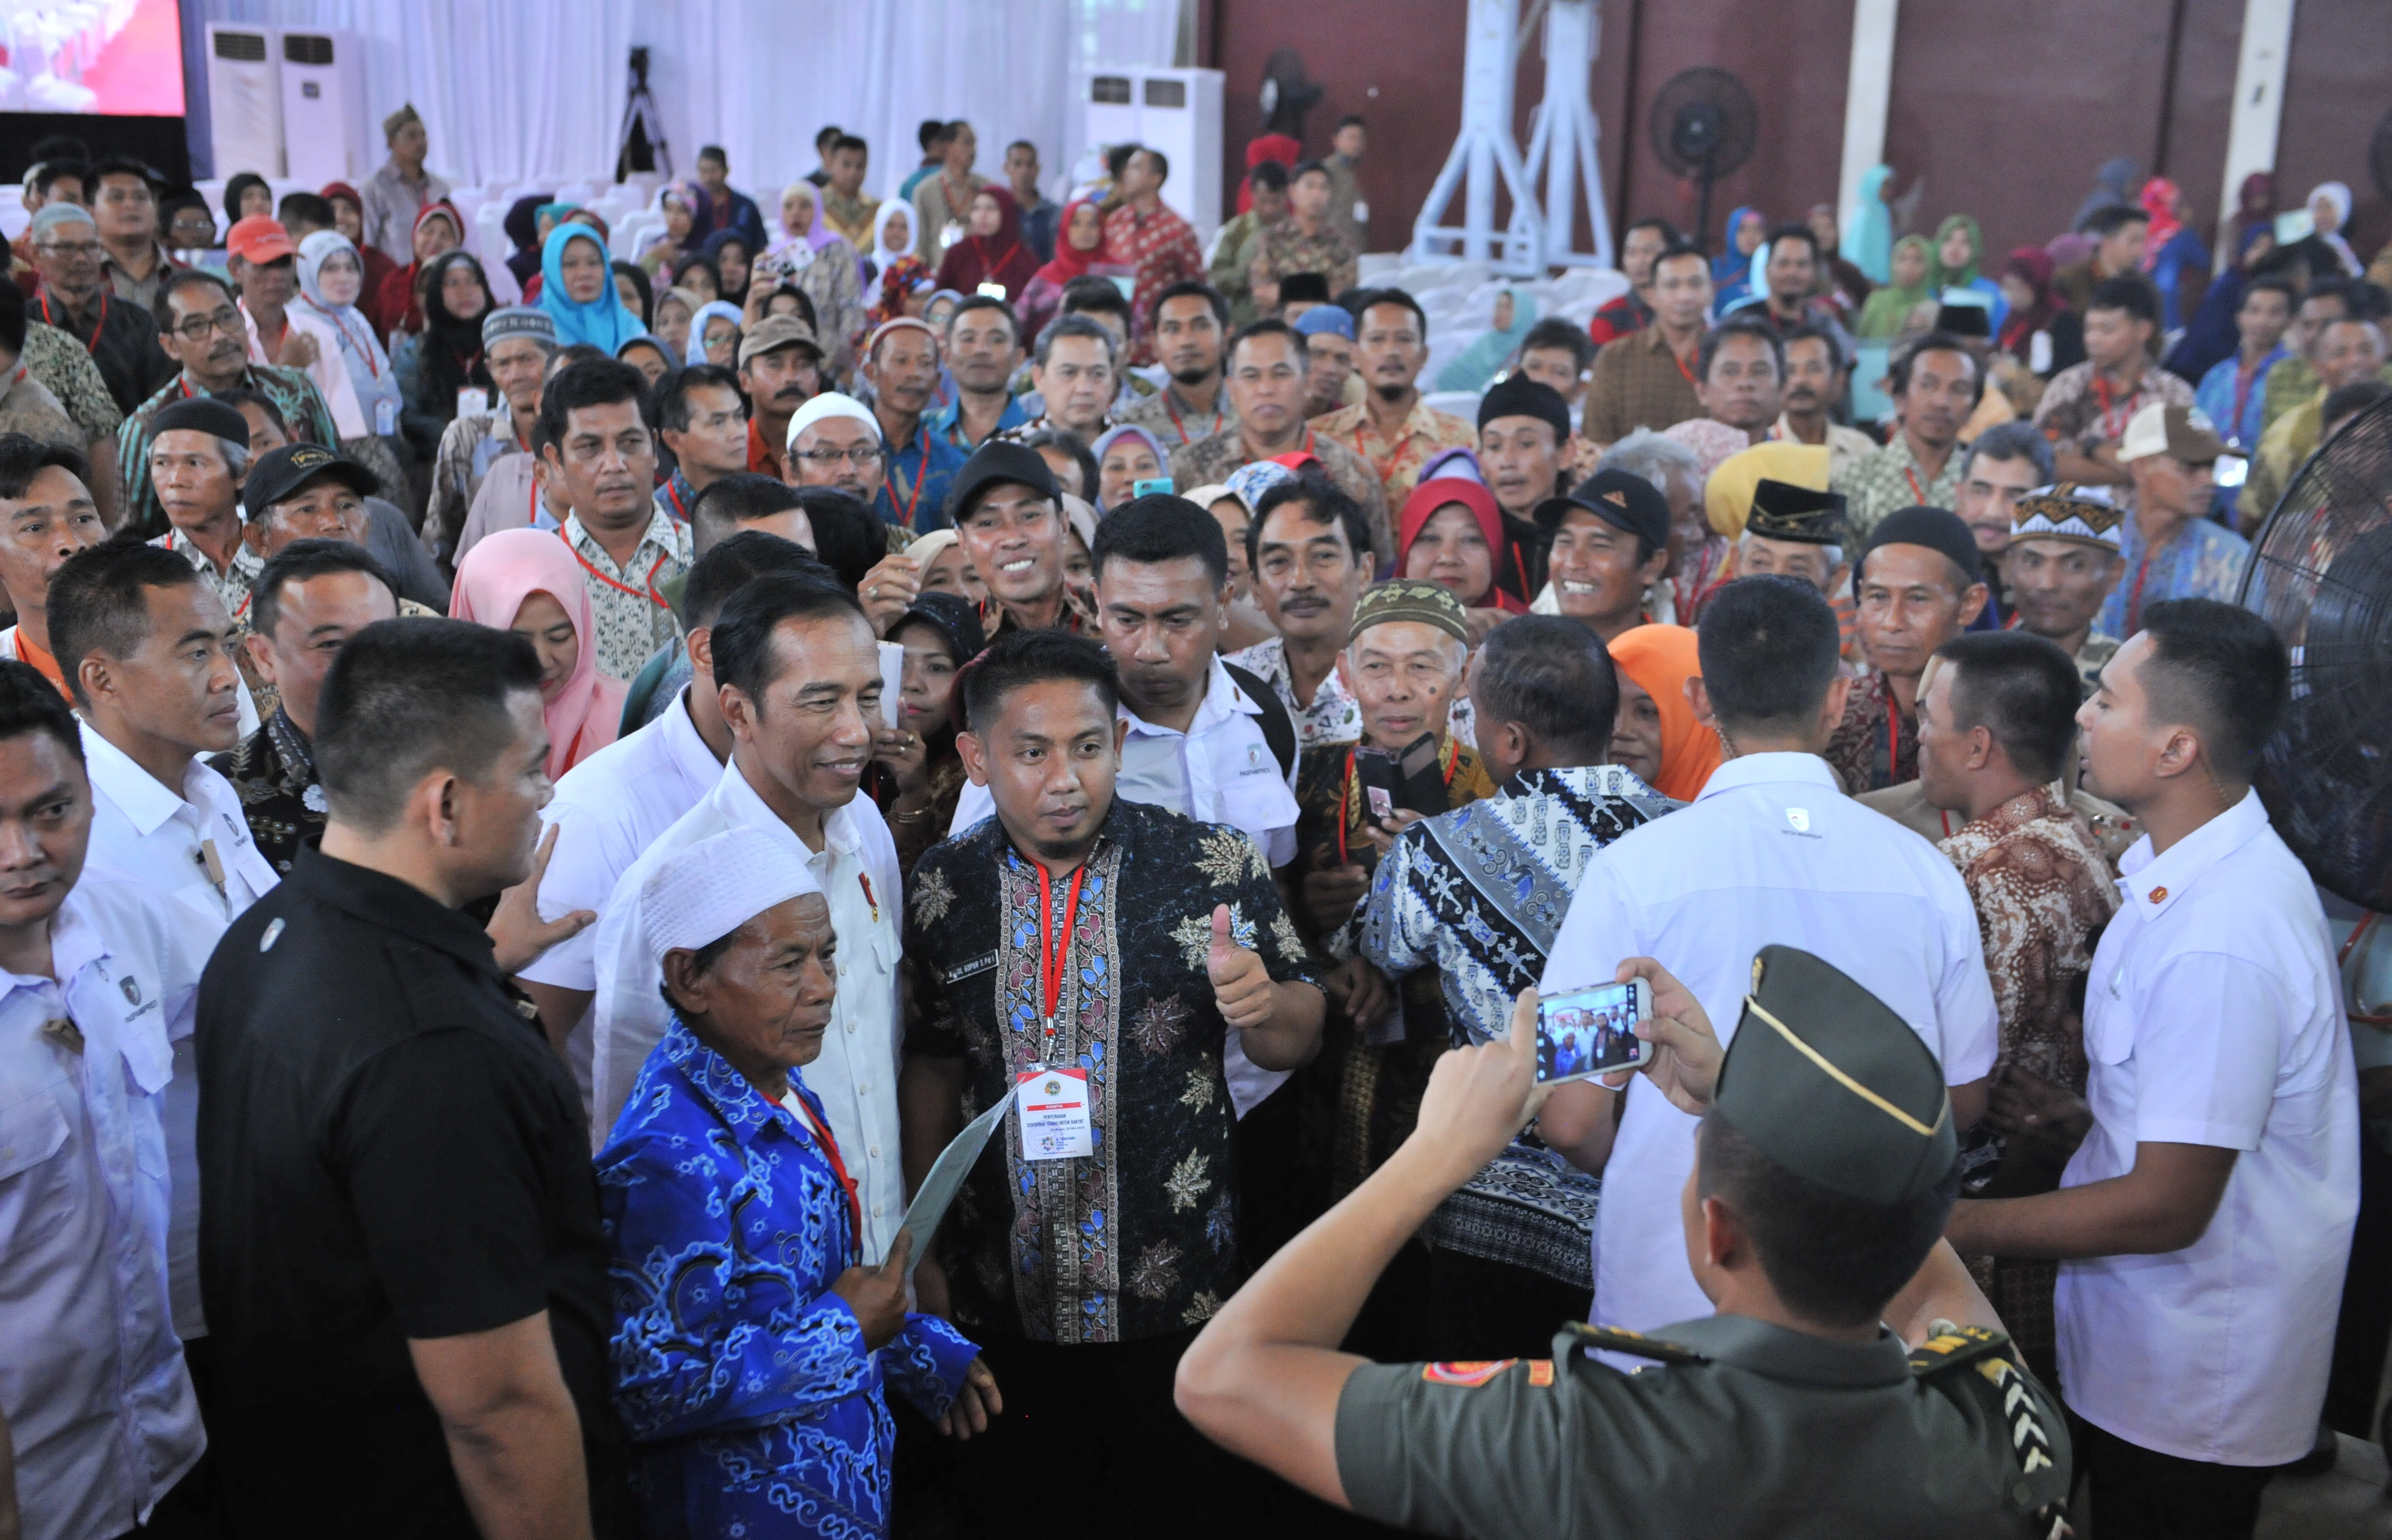 Ajak Jaga Persaudaraan, Presiden Jokowi: Jangan Sampai Dipanas-panasi Oleh Politisi